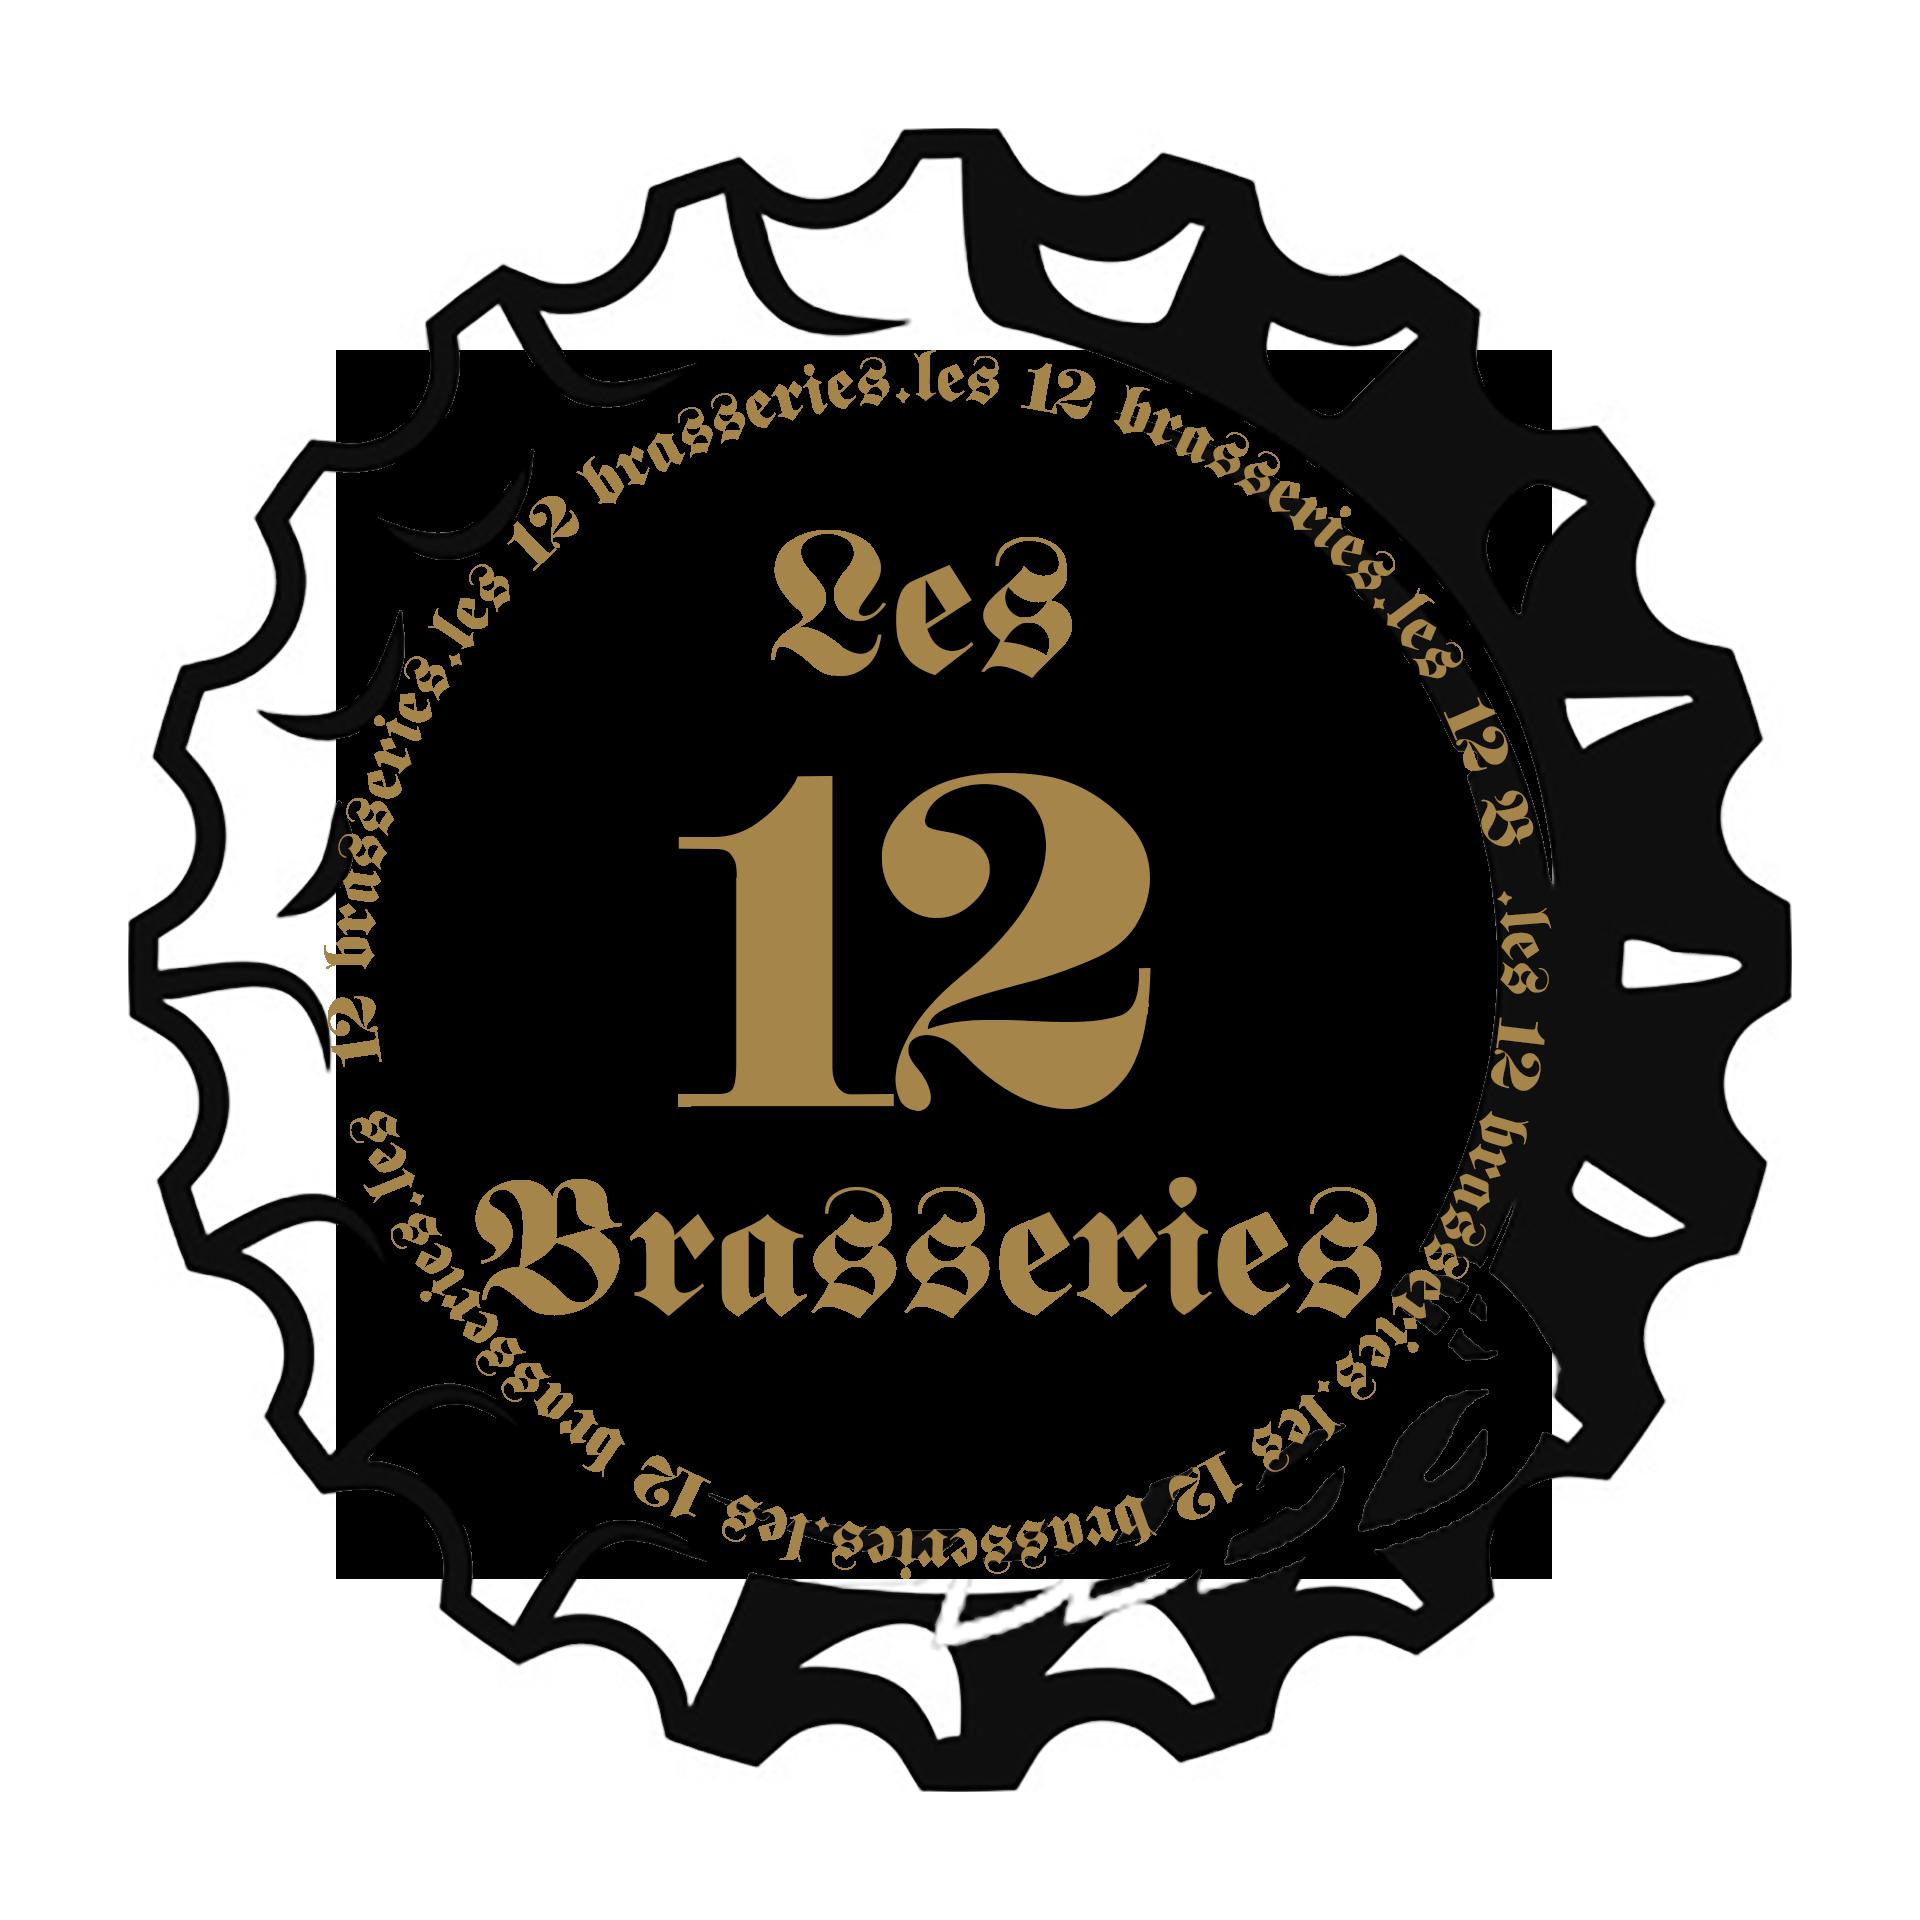 Les 12 Brasseries